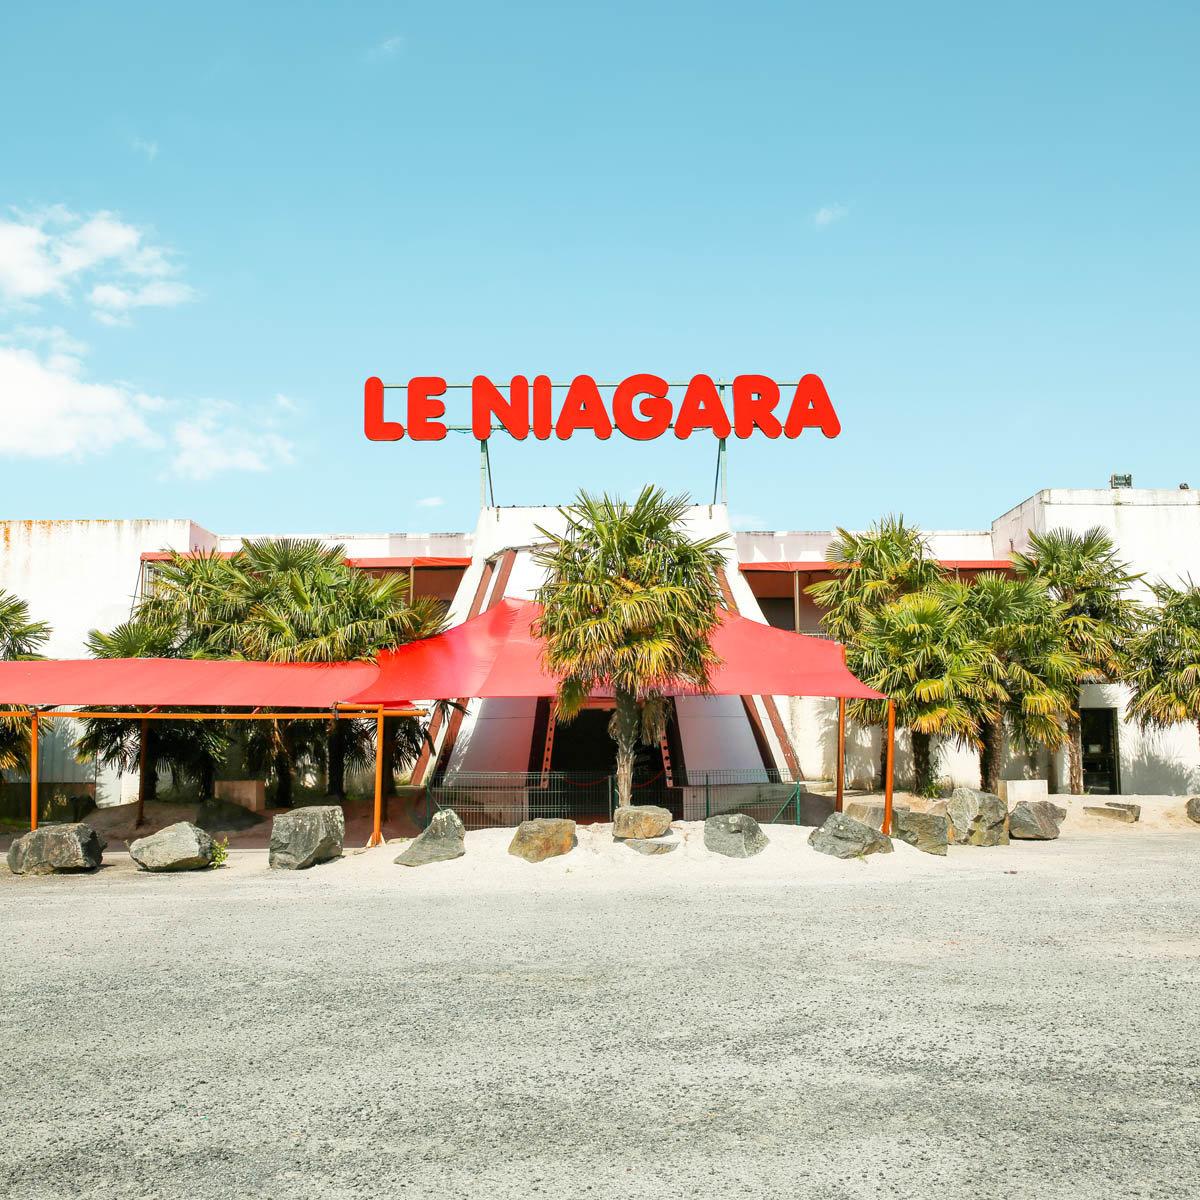 La Niagara